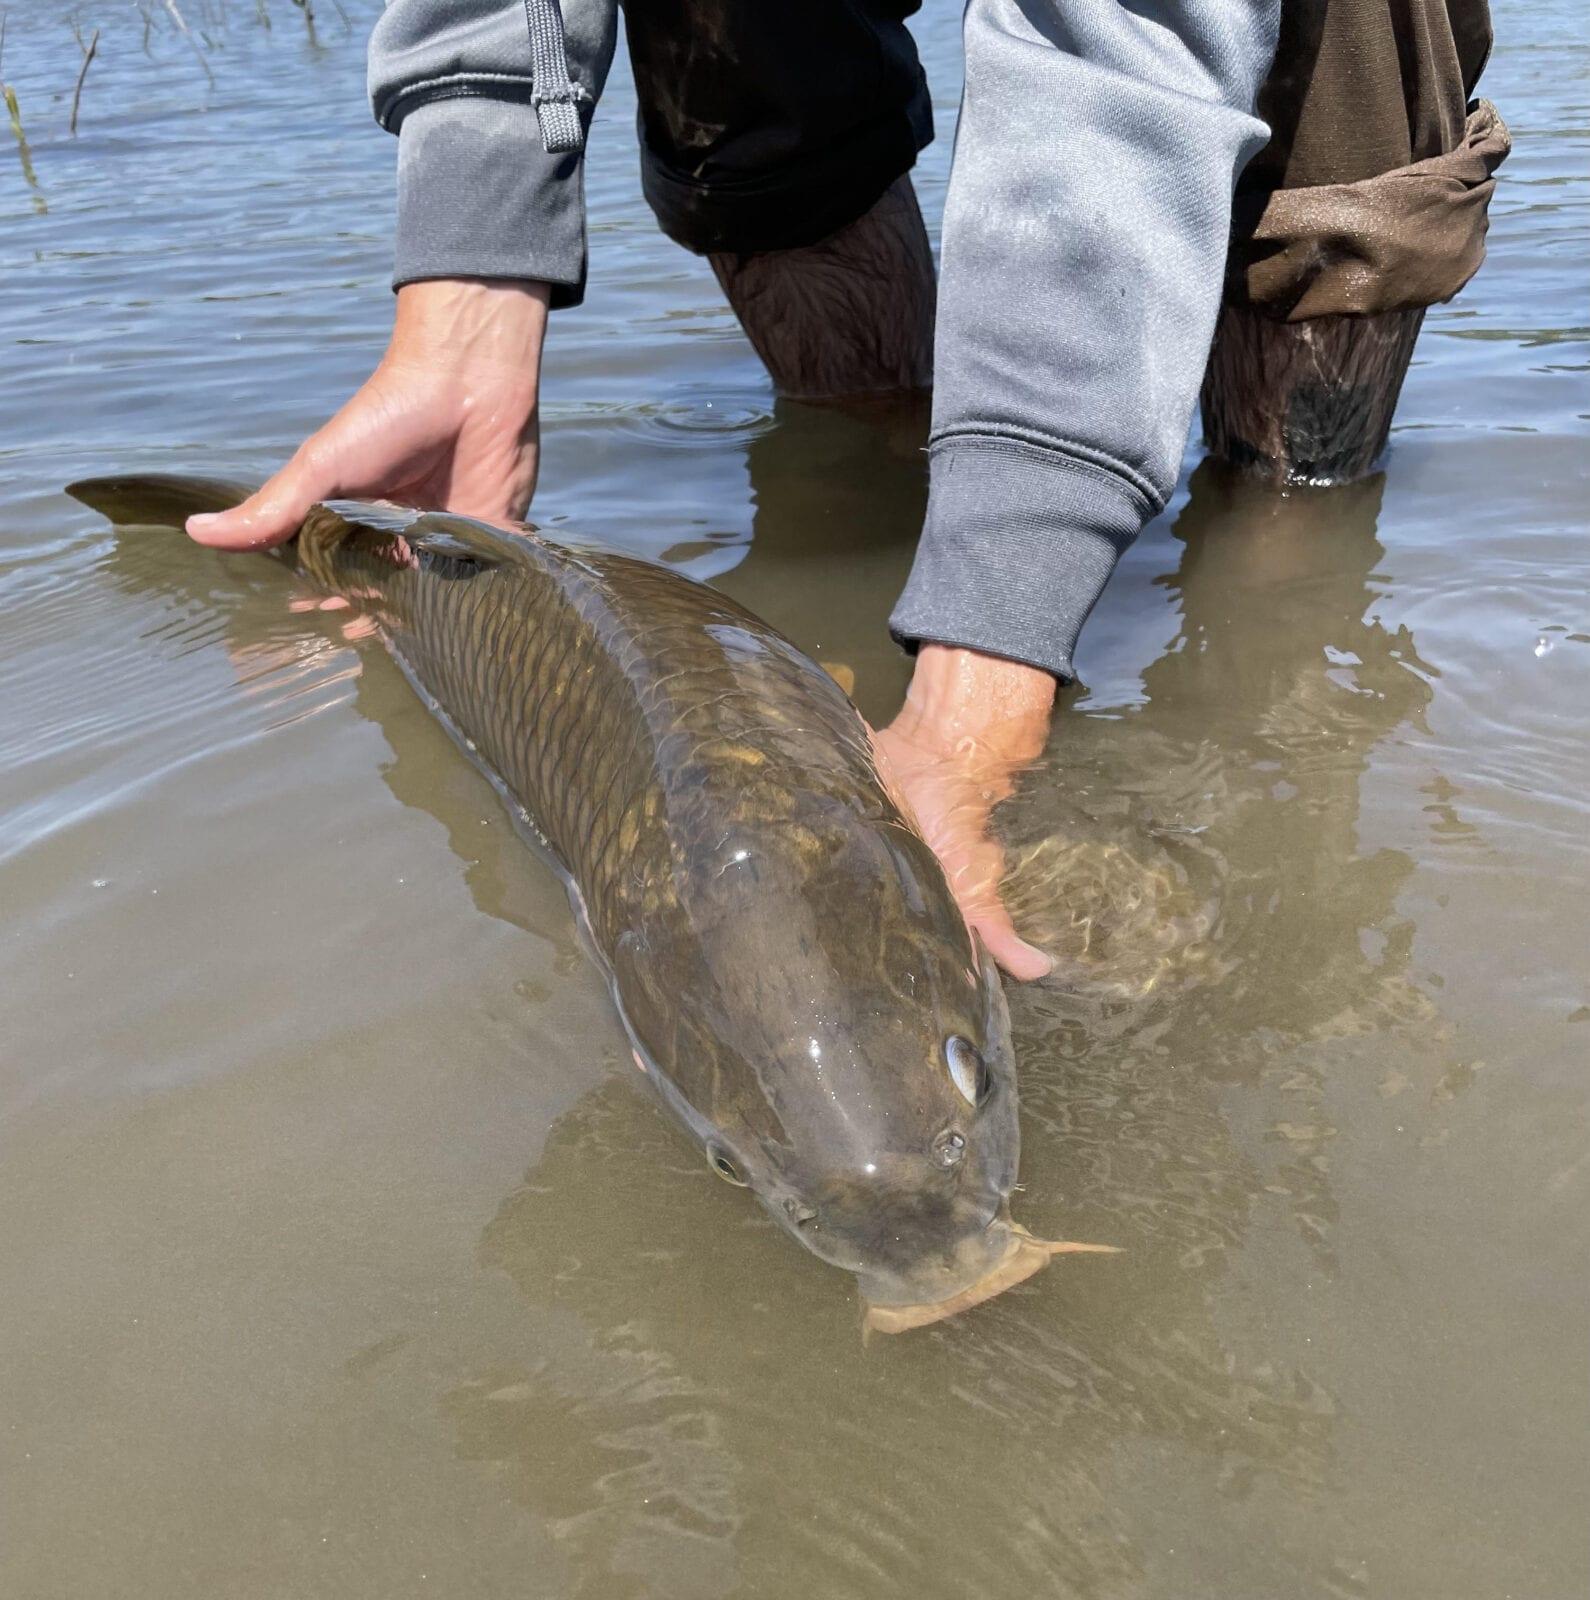 Common Carp from Oregon's Columbia River